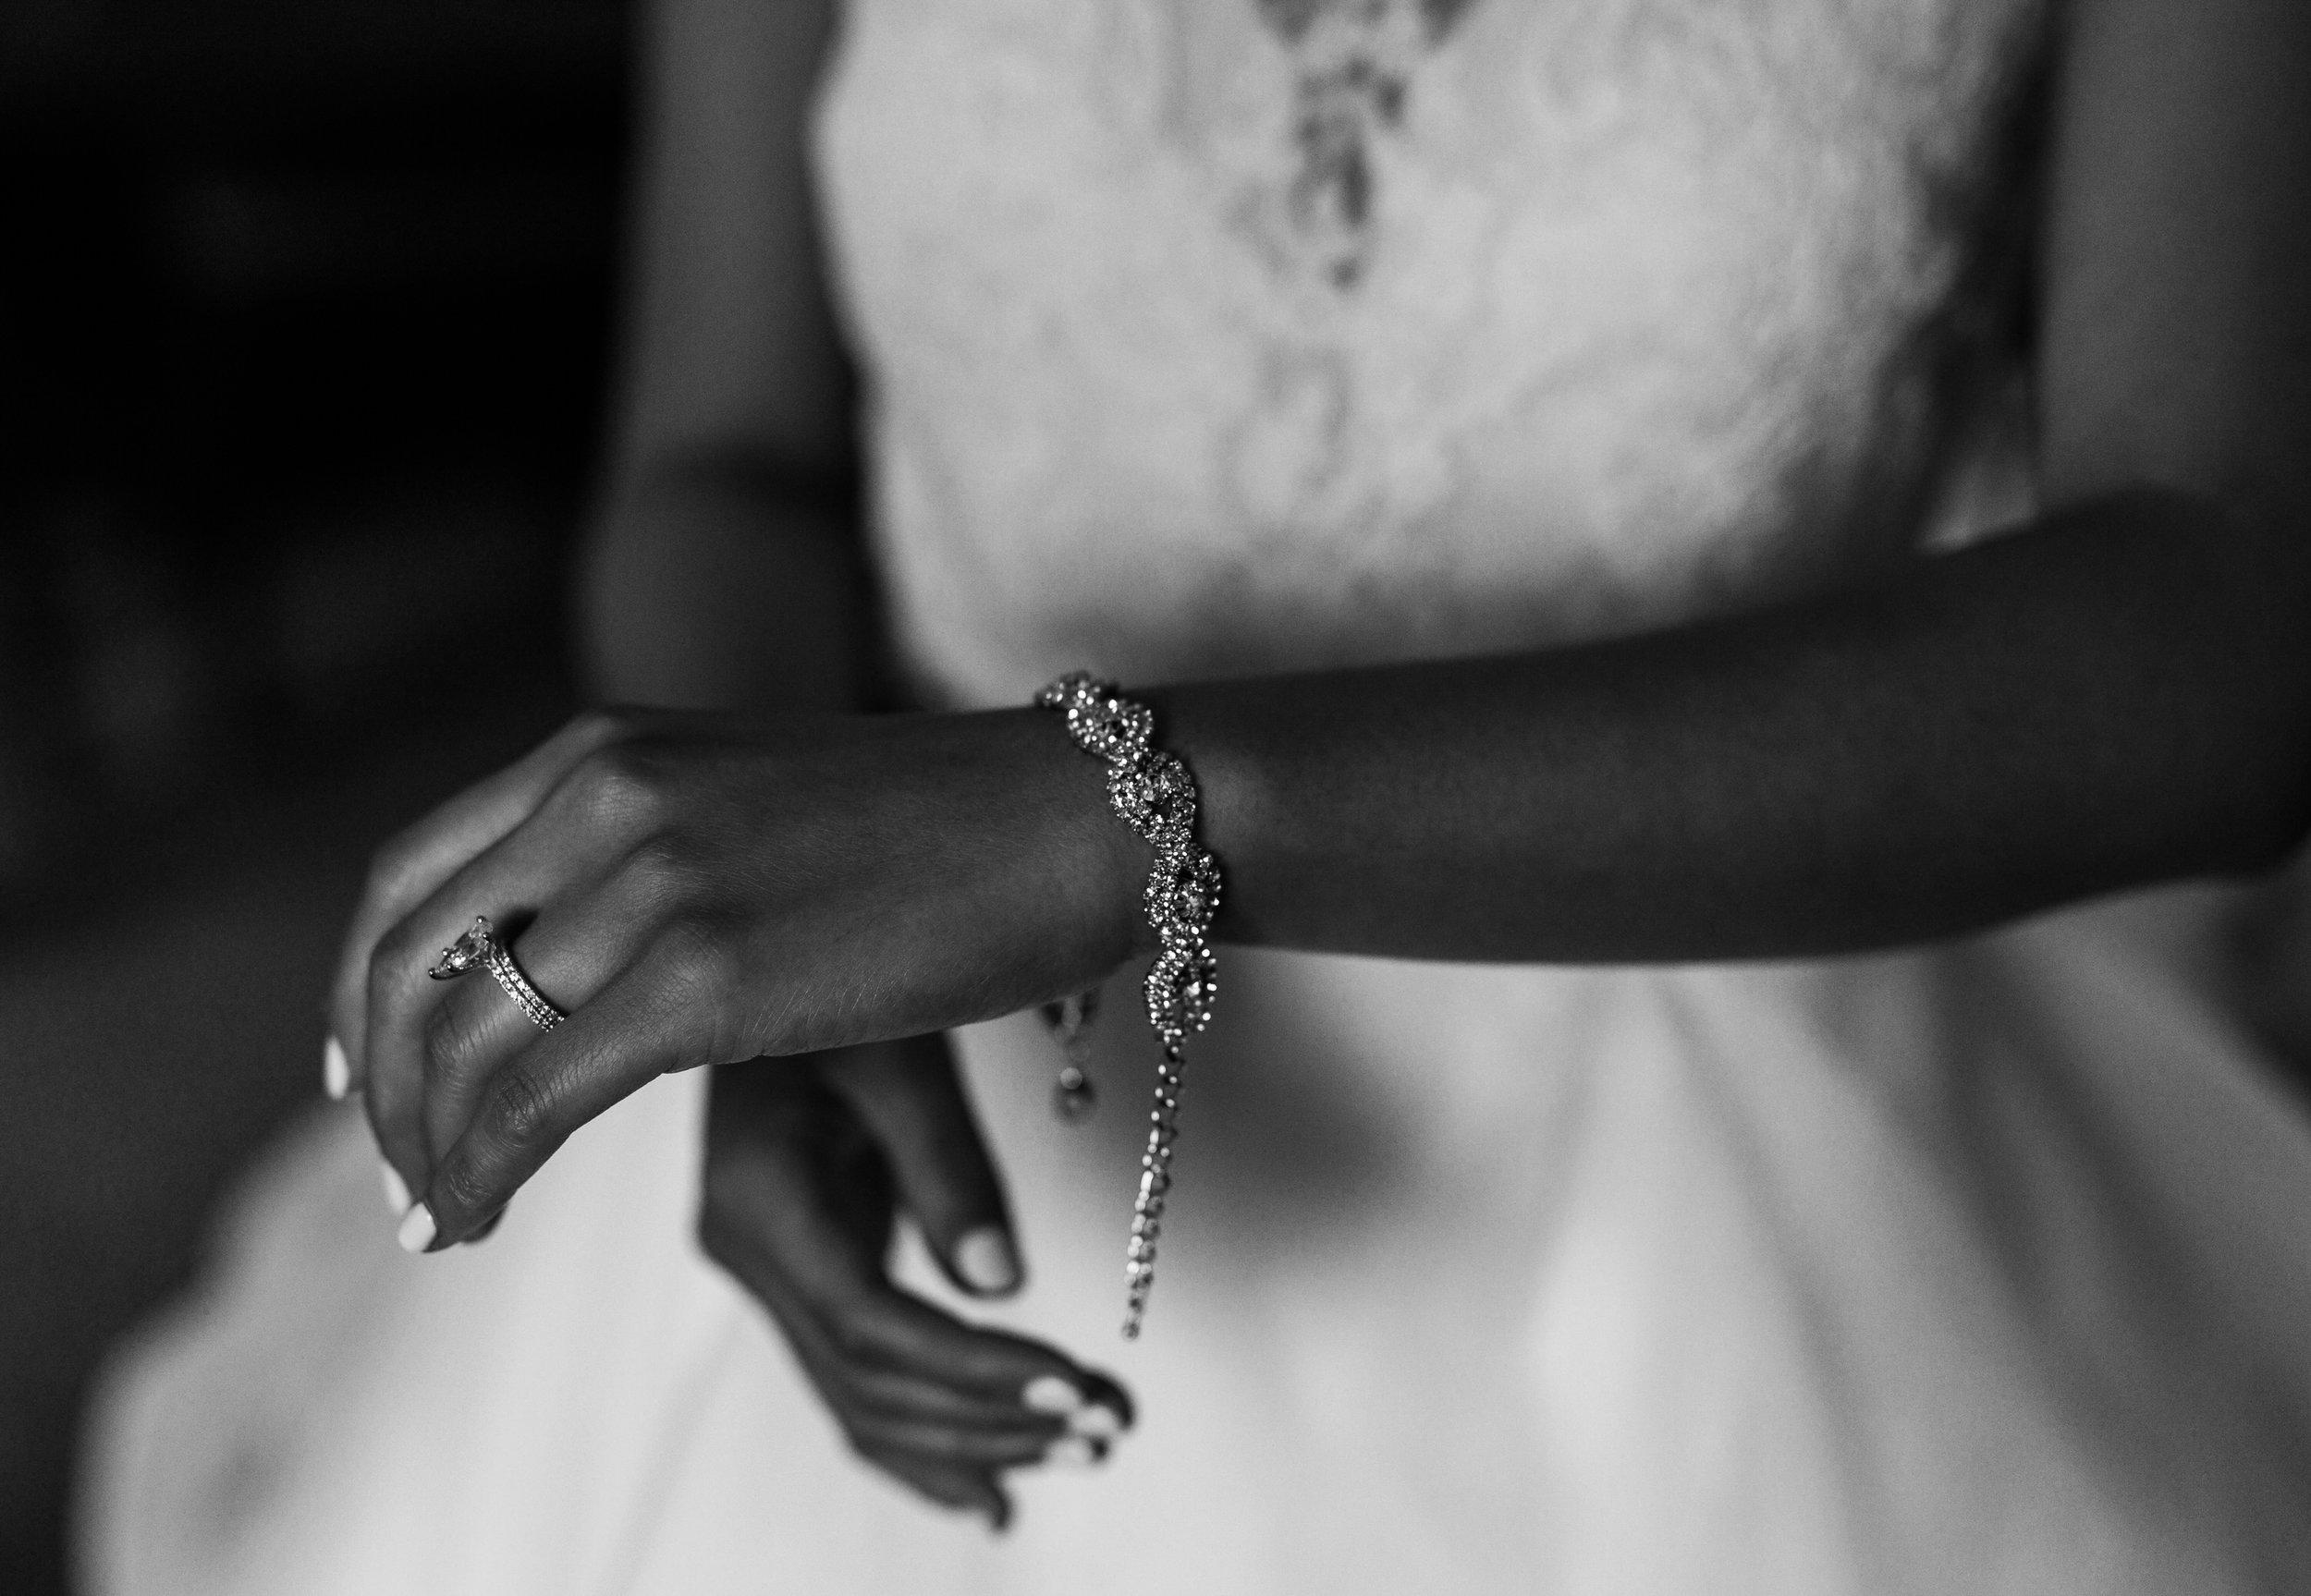 Squamish Wedding Photographer - Sea to Sky Gondola Wedding Photos -  Vancouver Wedding Photographer & Videographer - Sunshine Coast Wedding Photos - Sunshine Coast Wedding Photographer - Jennifer Picard Photography - IMG_1916.jpg